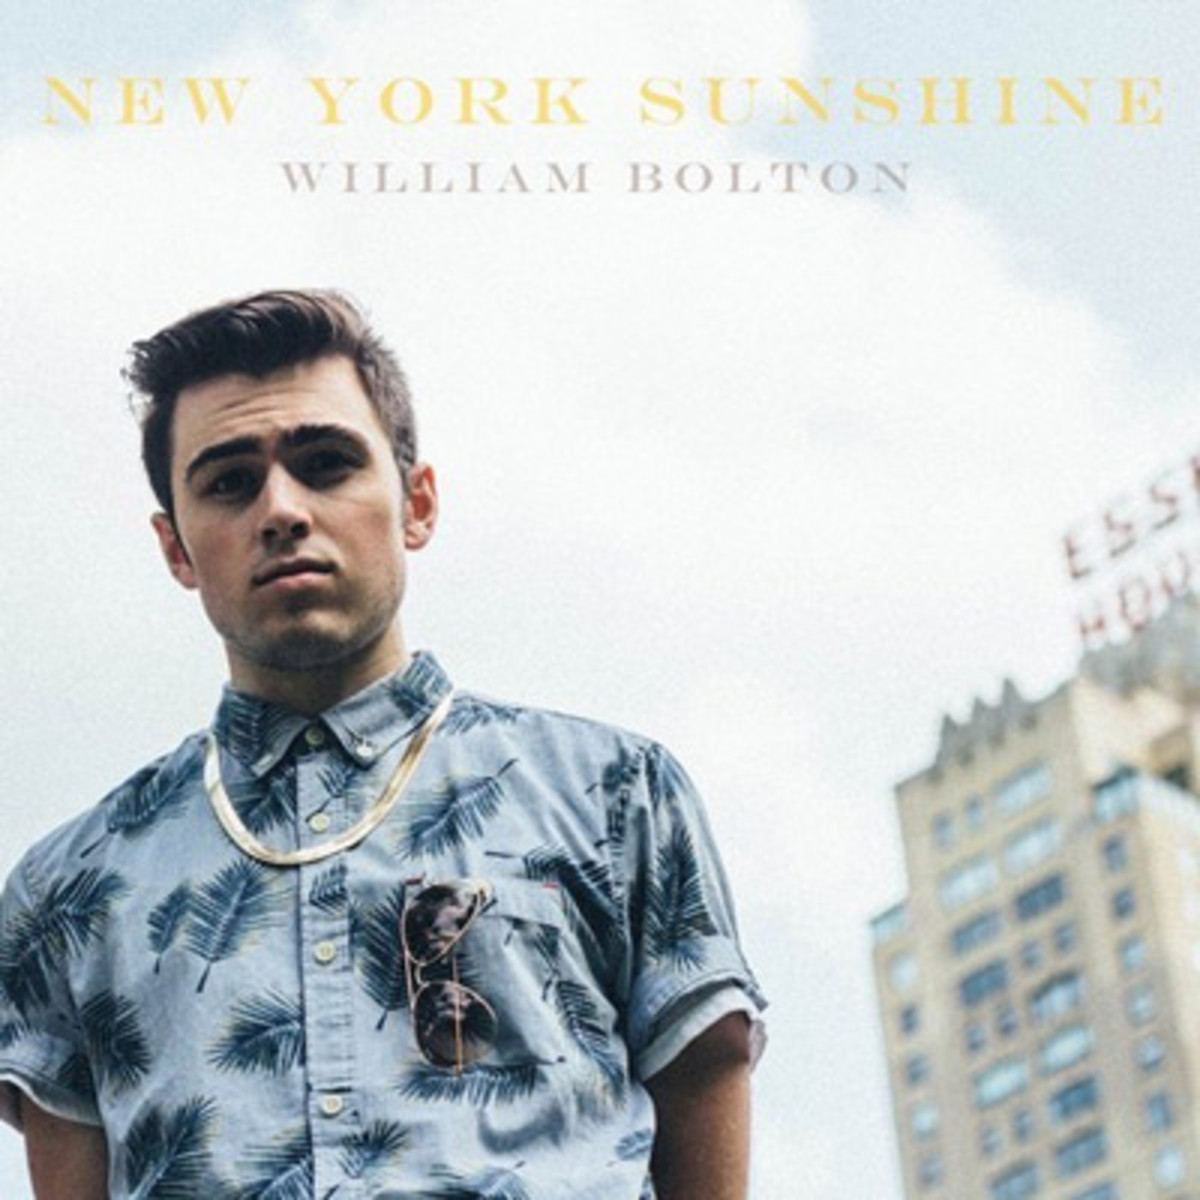 williambolton-newyorksunshine.jpg